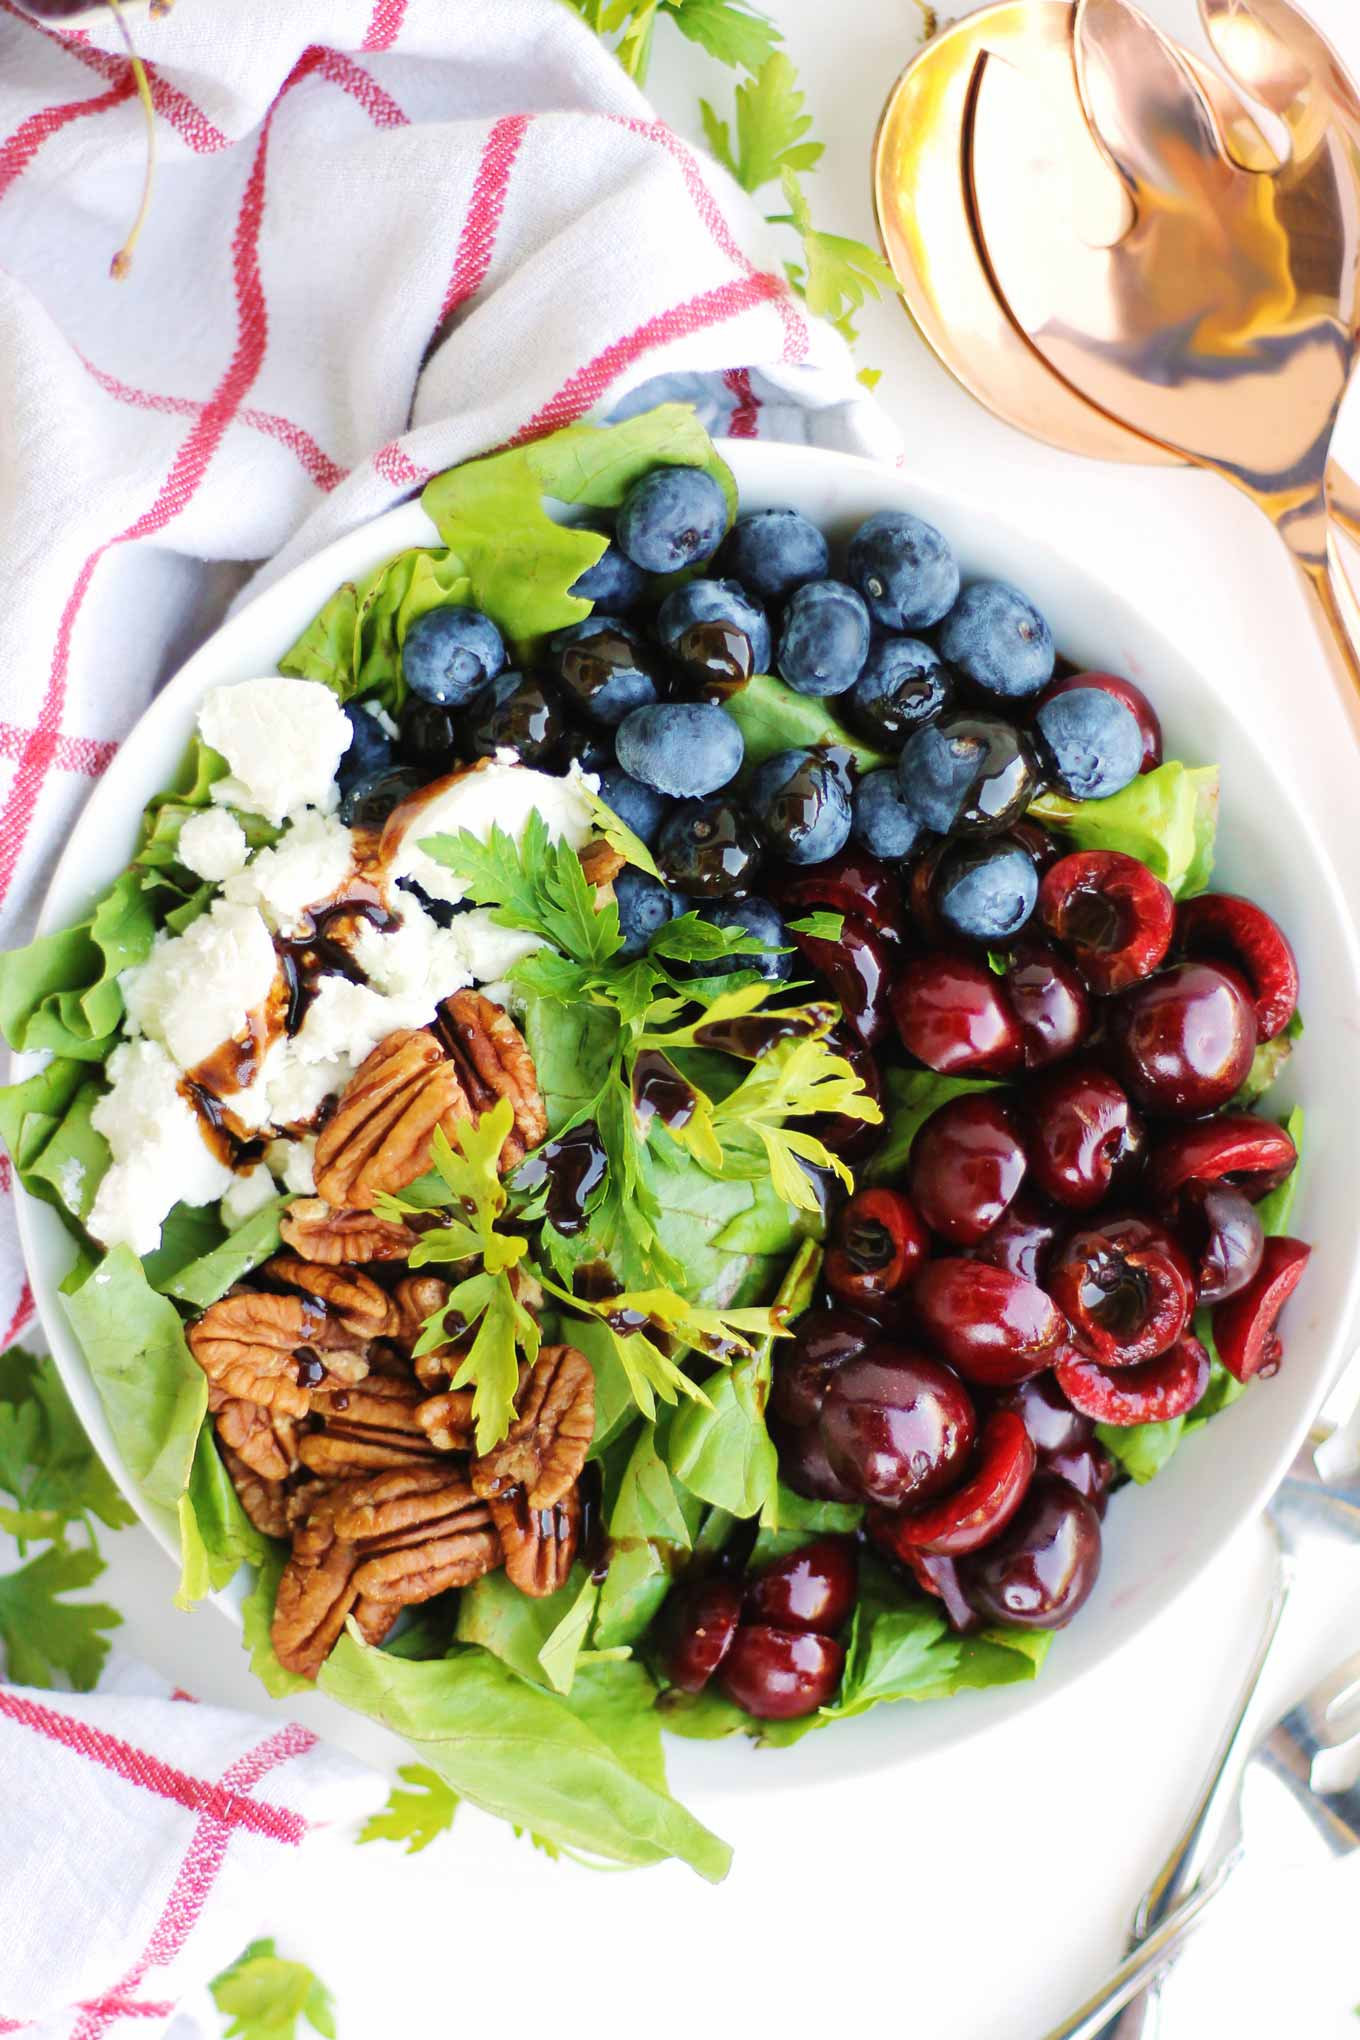 Cherry blueberry salad